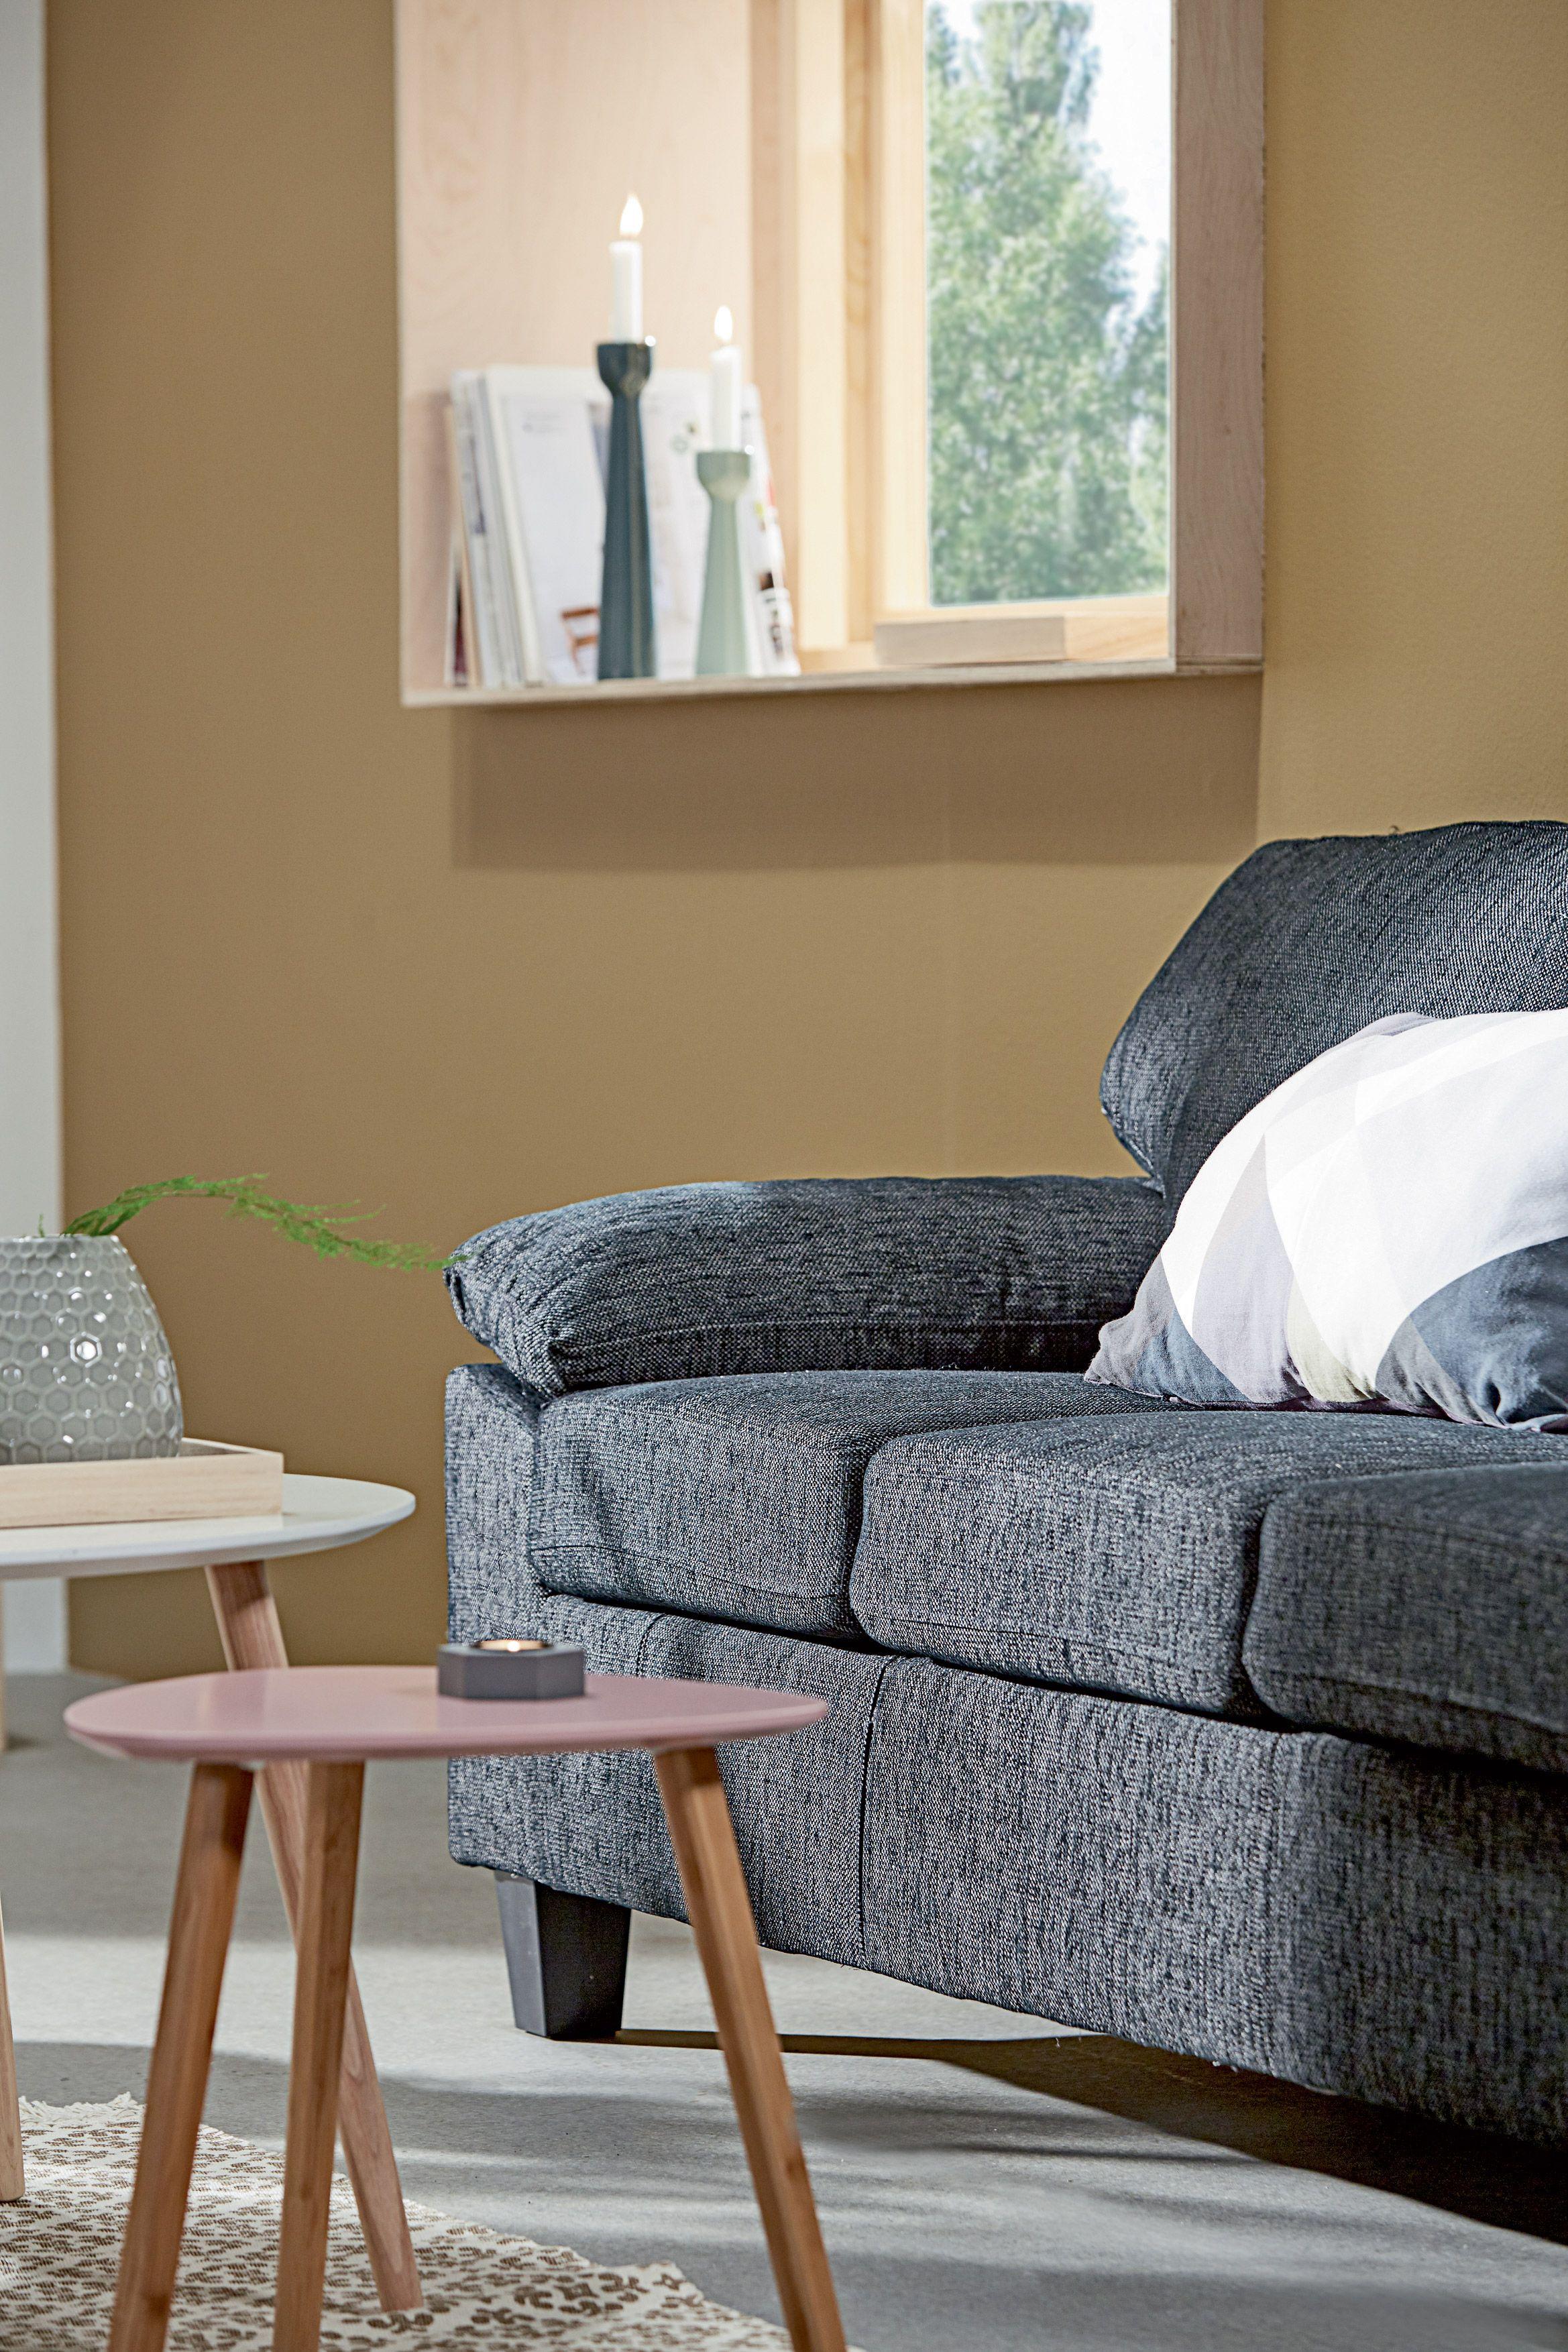 GEDSER sofa TAPS hj¸rnebord rosa detaljer